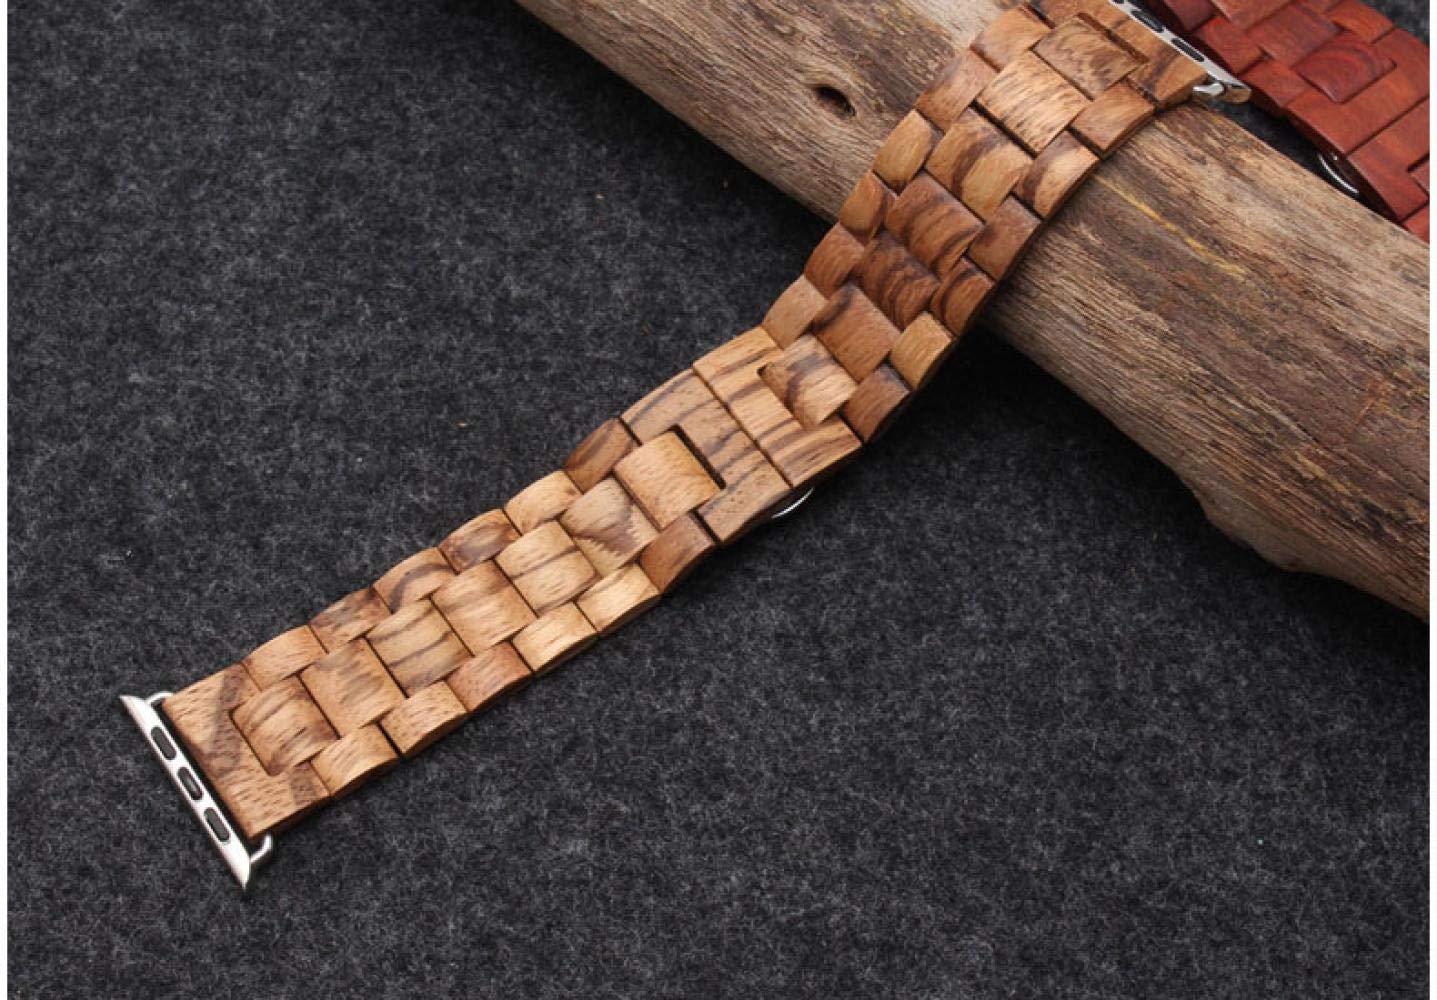 for Apple Watch Band Wrist Watch Strap 4series Watch Strap 38mm/40mm Watch Strap 42m/44mm for Apple Watch Band 42 Apple Watch Band for Series 1 2 3 4 Wrist Band Watch Holder (Light Brown, 38mm40mm)